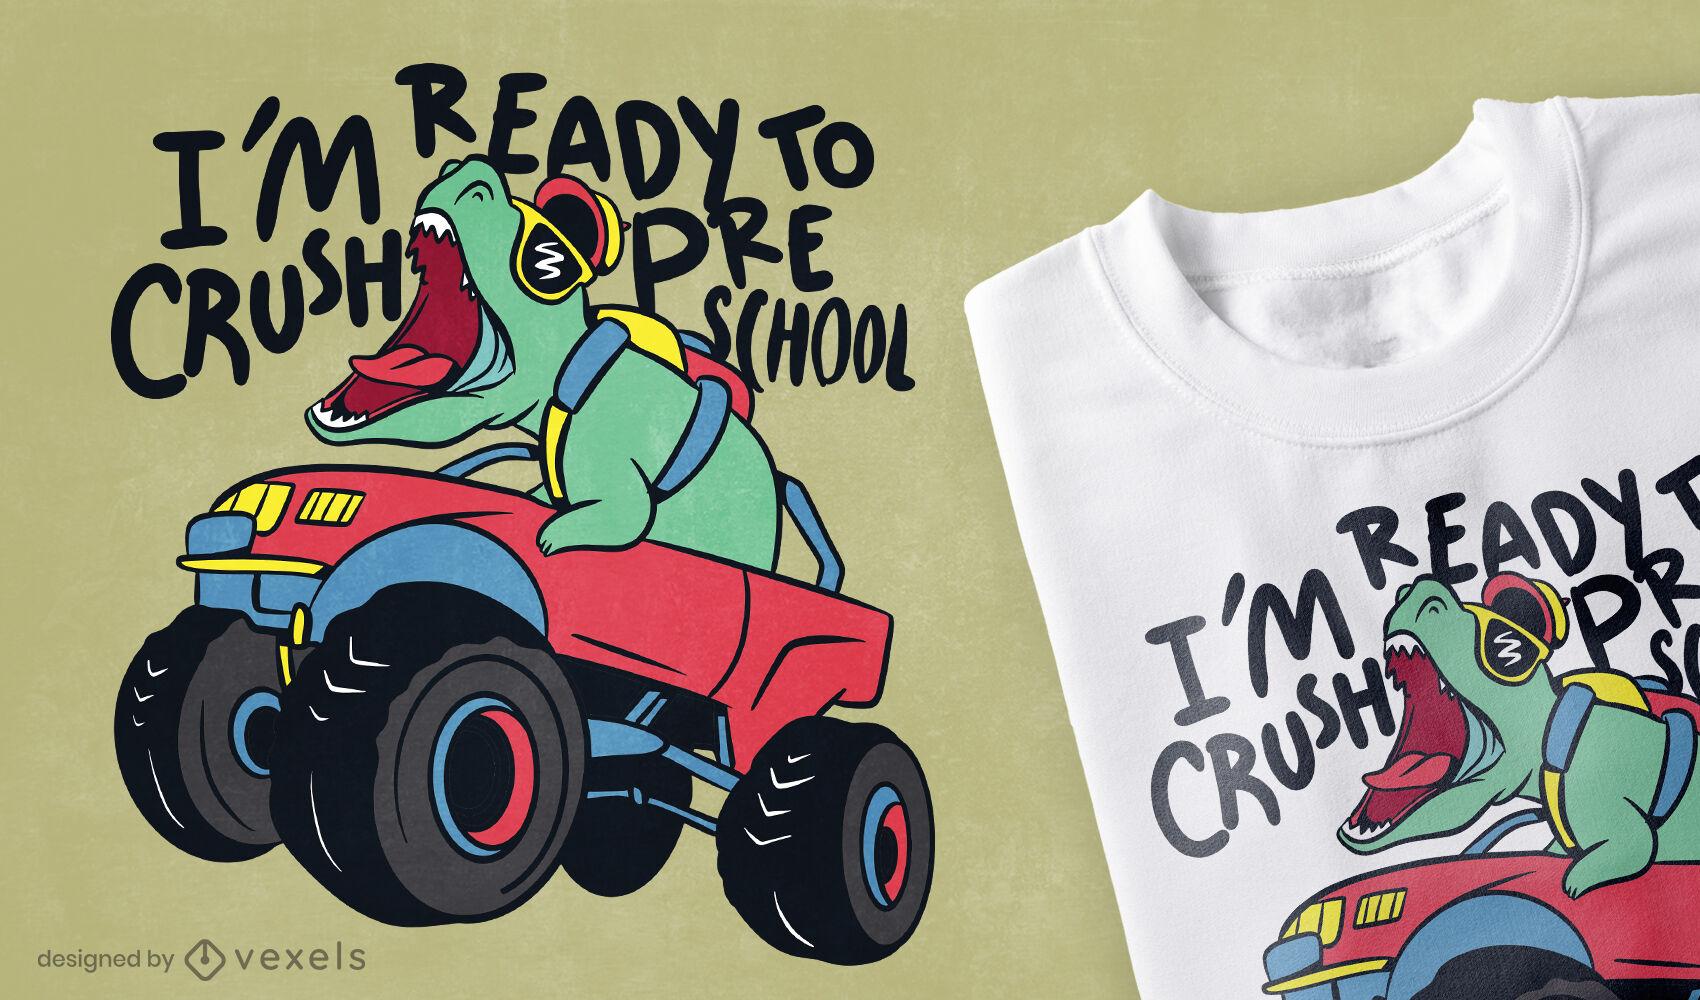 Crush preschool t-shirt design